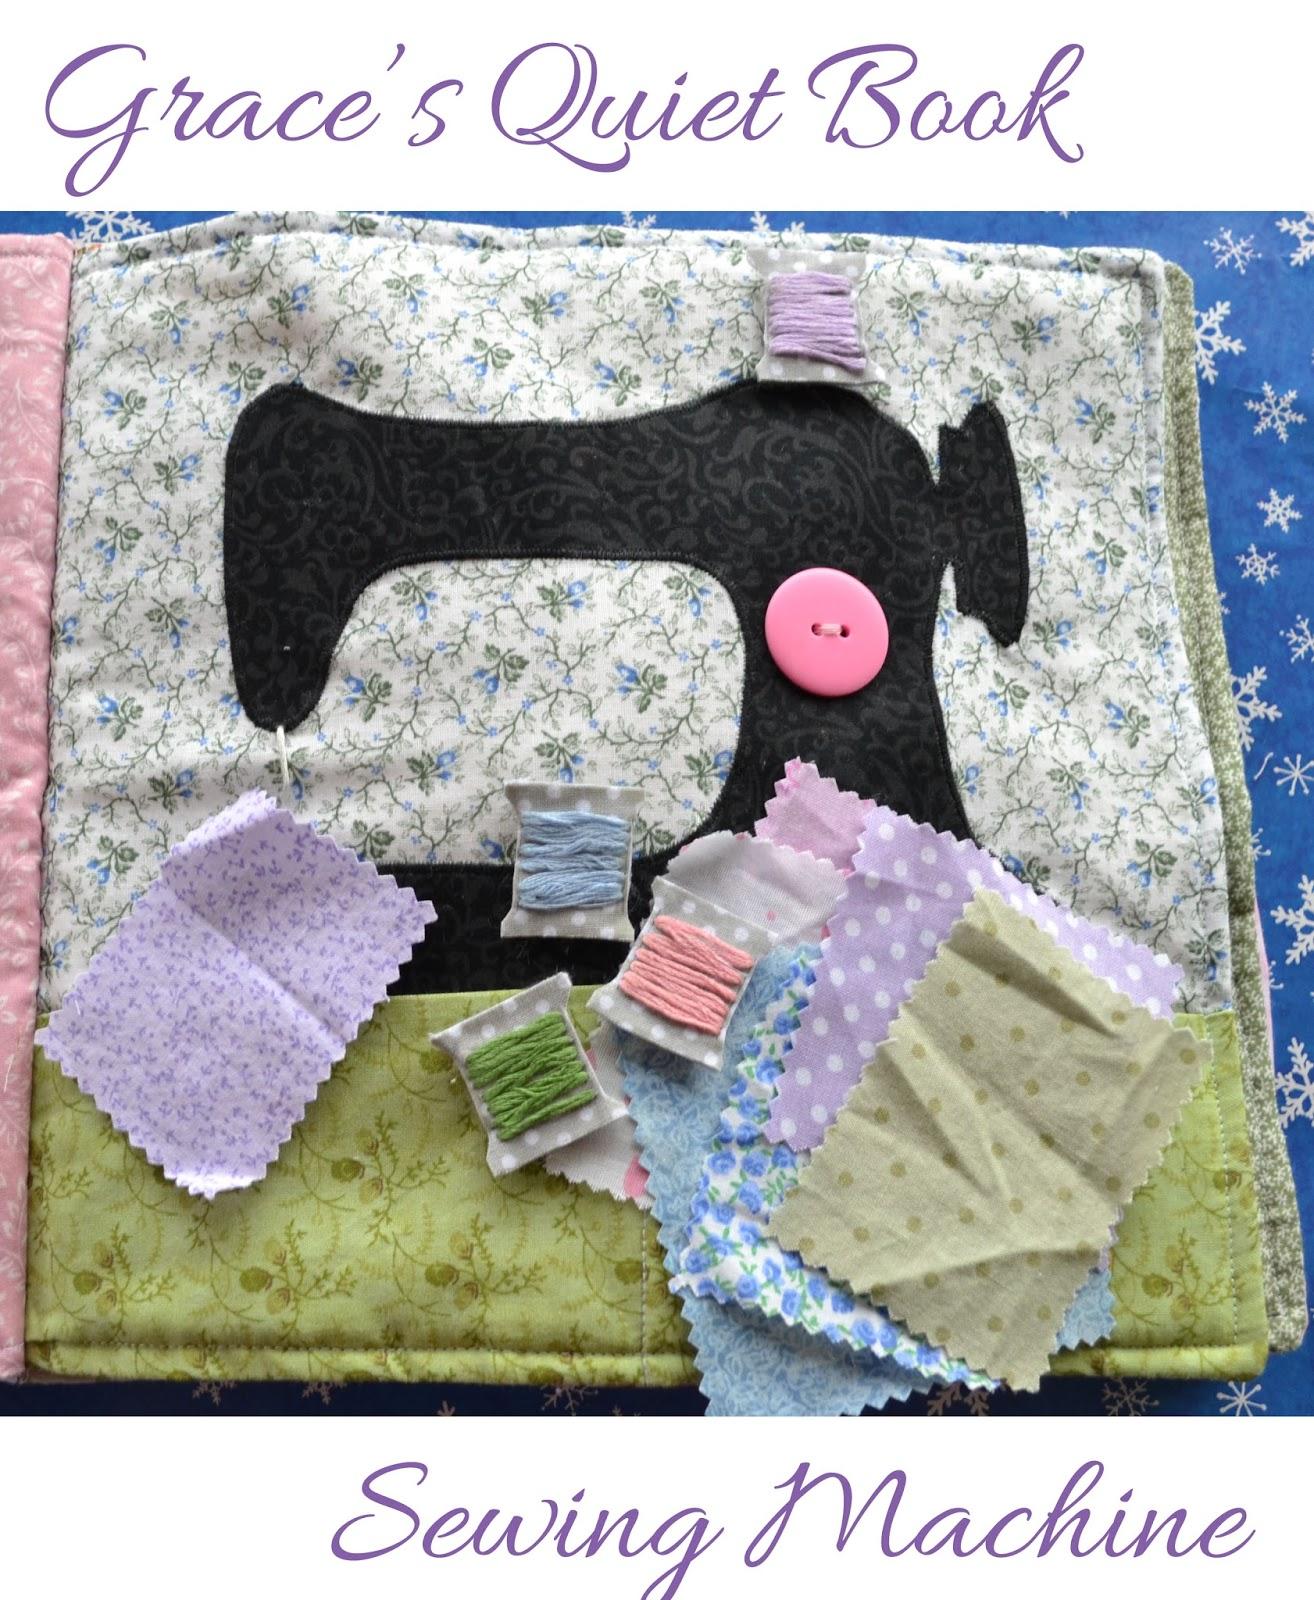 Grace's Quiet Book- Sewing Machine